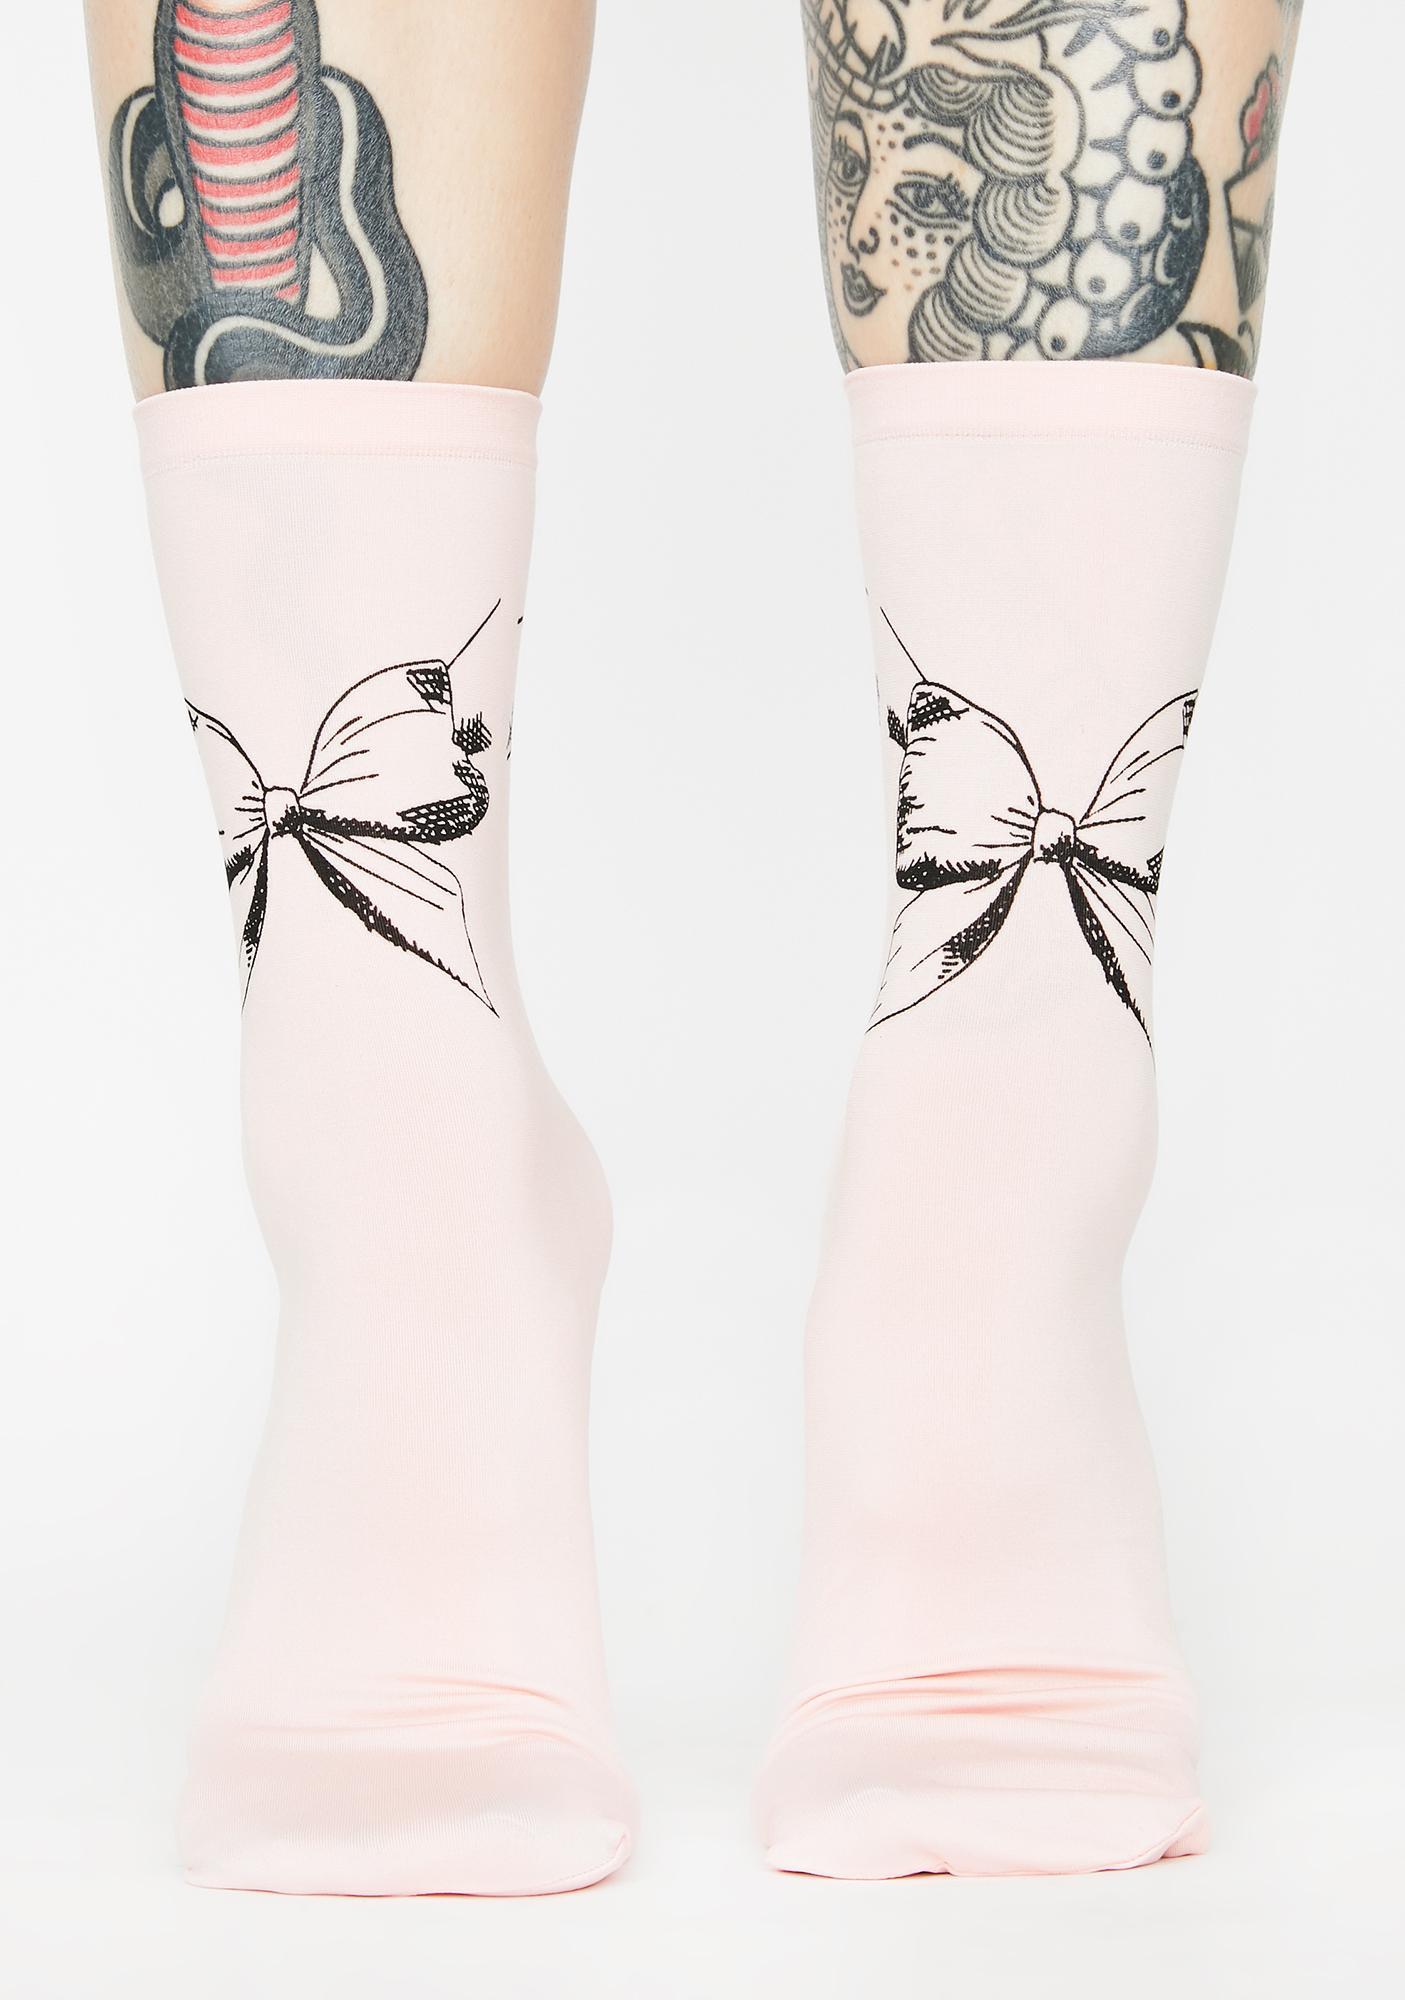 MeMoi Put A Bow On It Ankle Socks